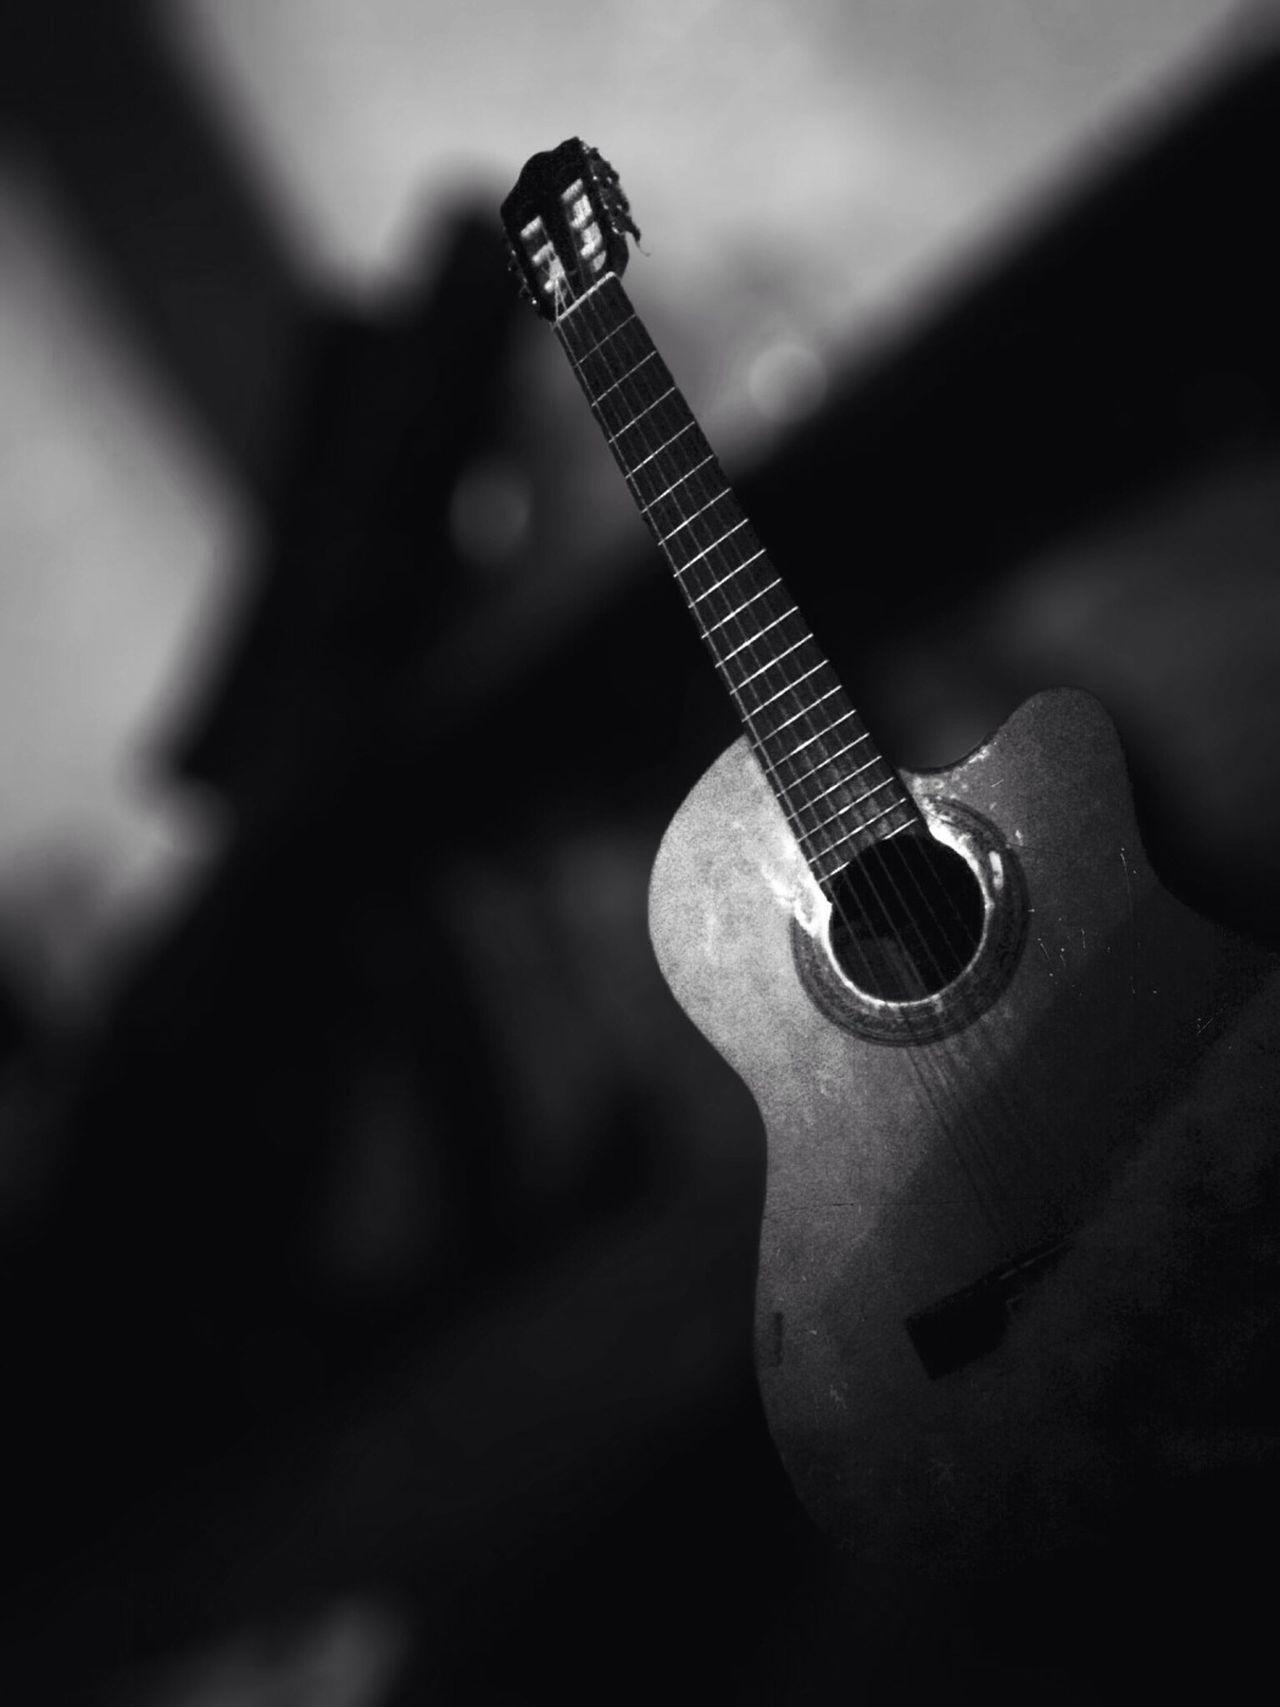 Beautiful stock photos of guitar, Acoustic Guitar, Arts Culture And Entertainment, Guitar, Home Interior